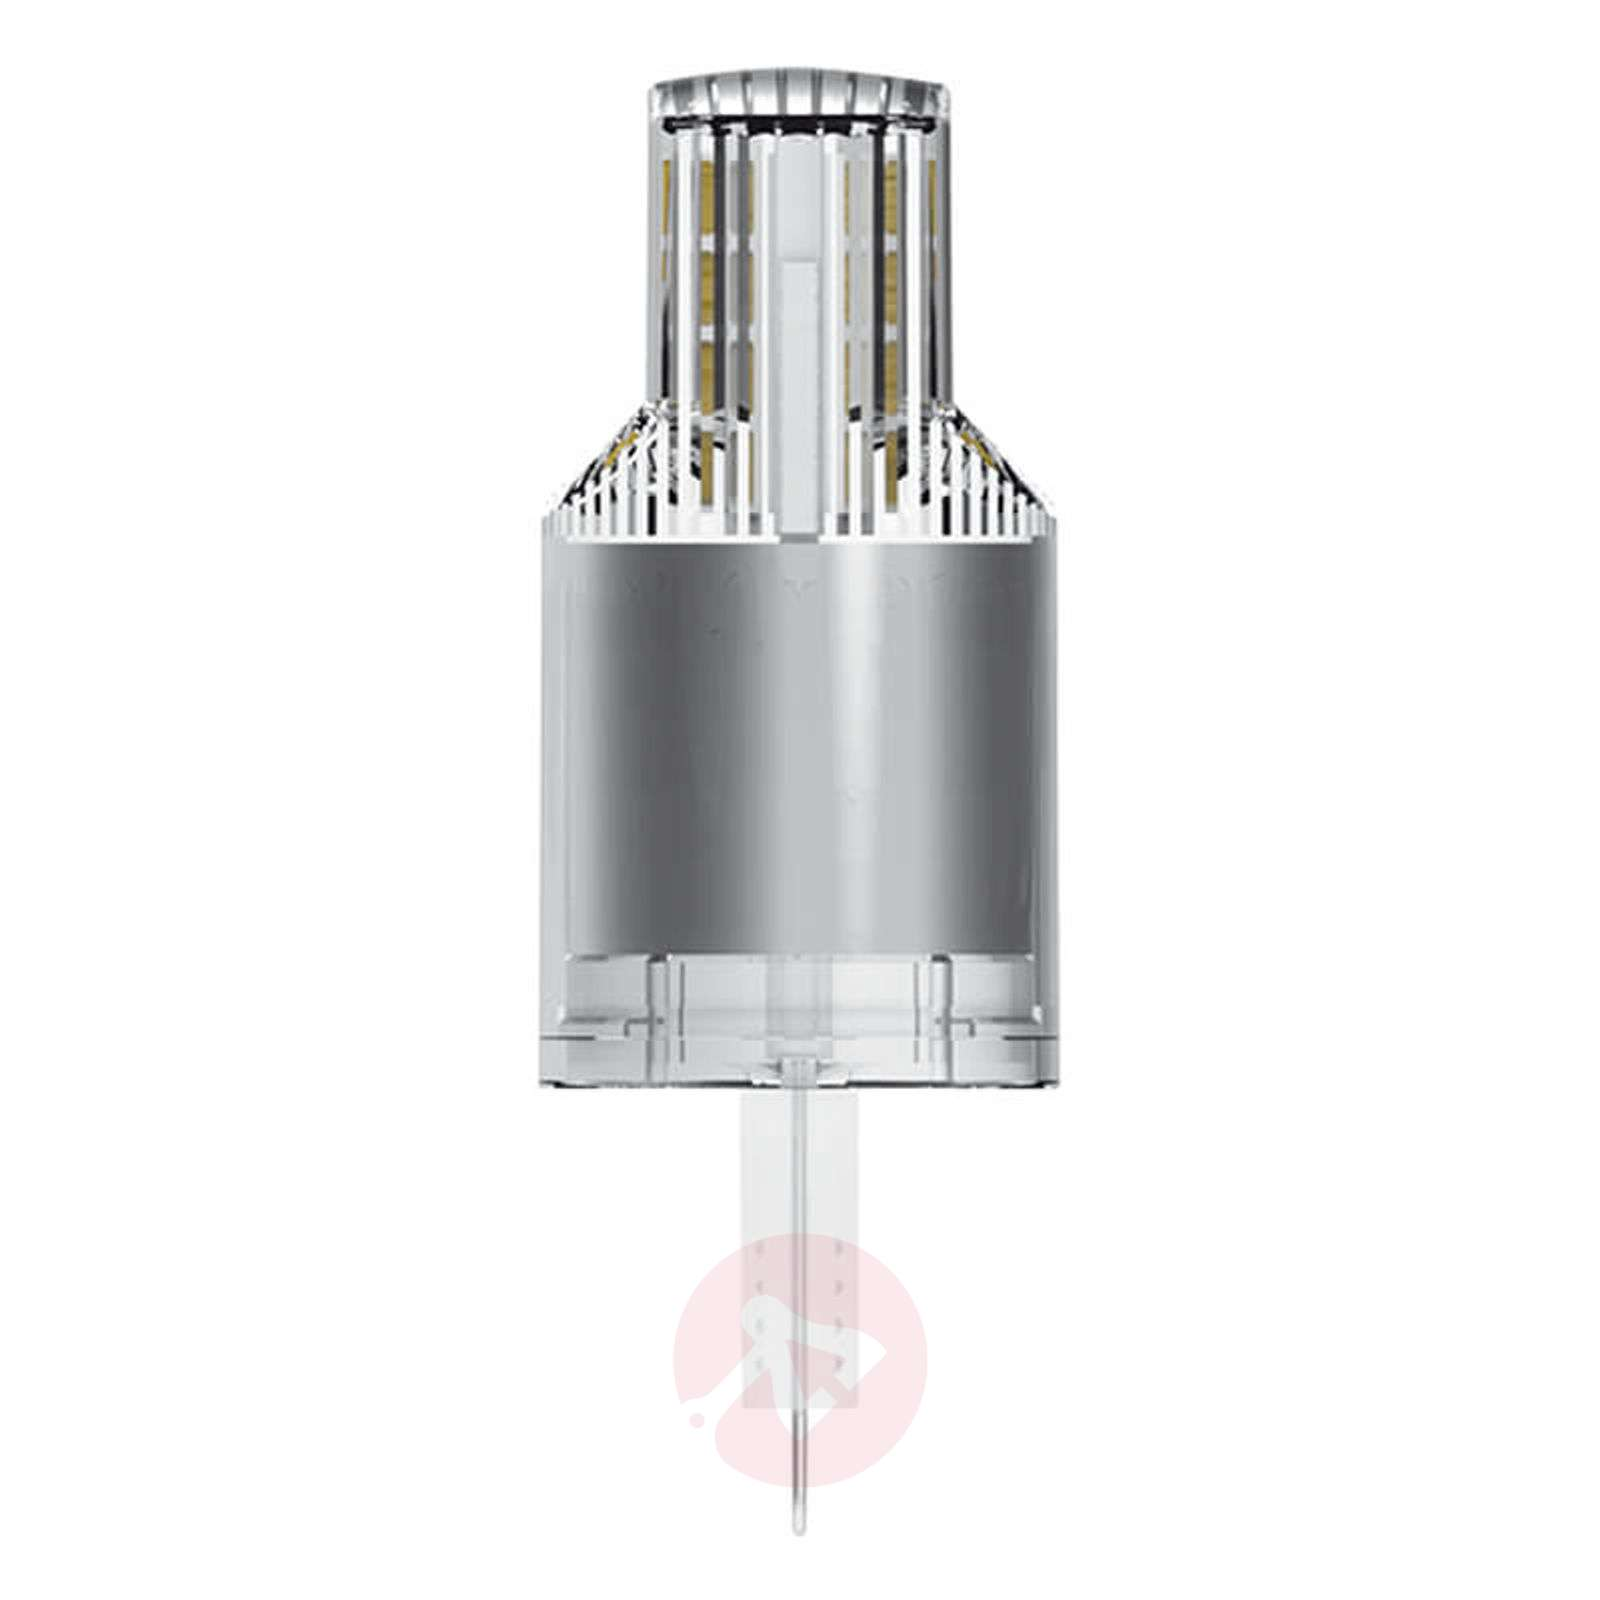 LED bi-pin bulb G9 3.5W, warm white, dimmable-7262067-01